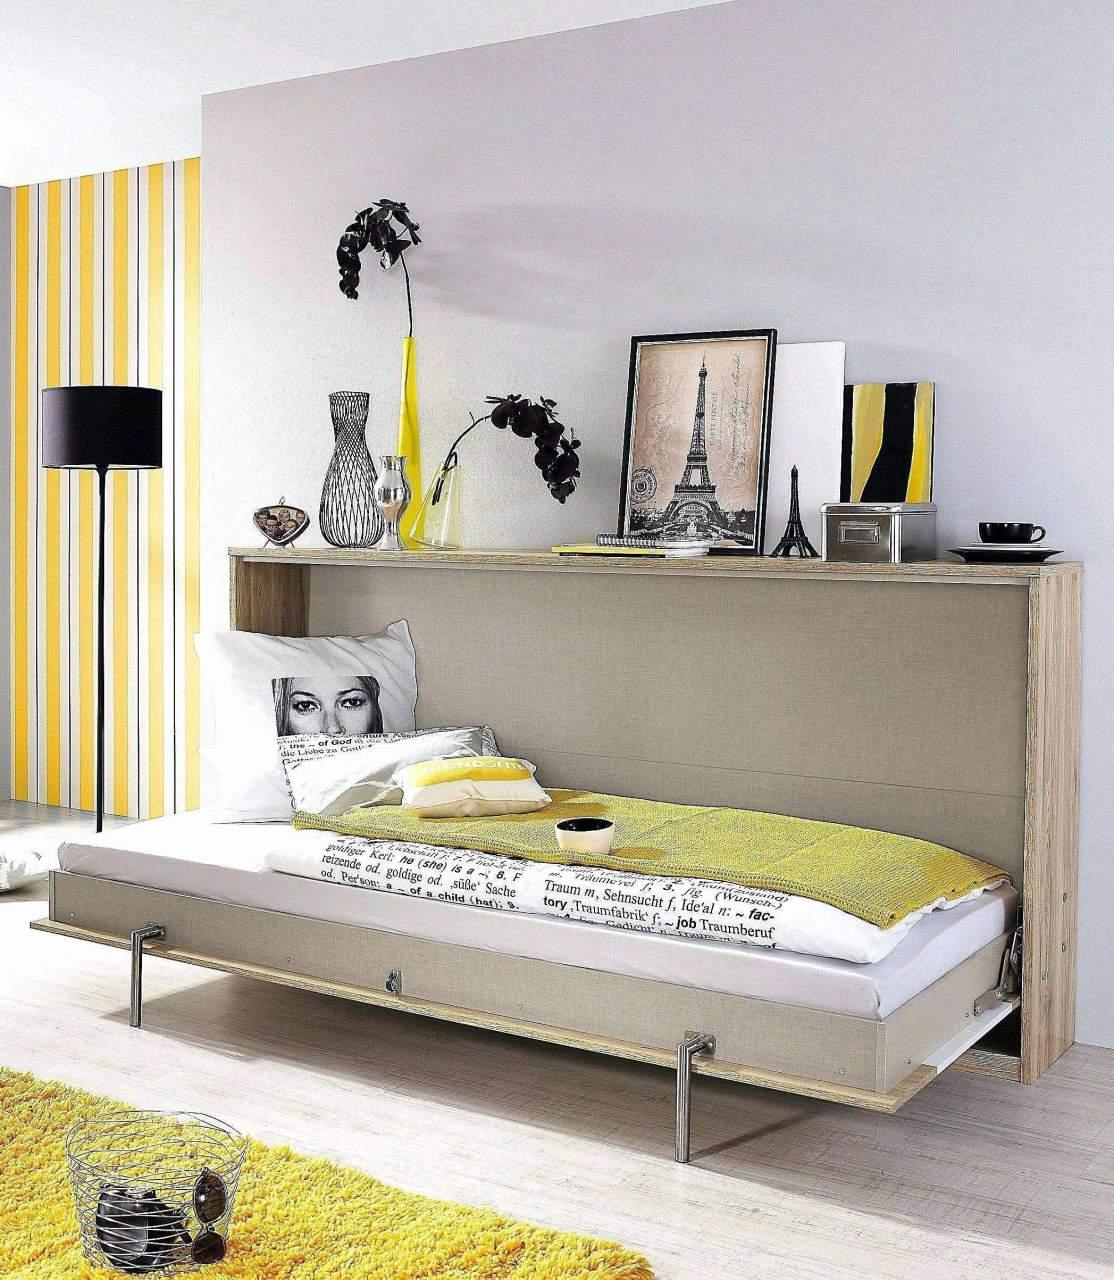 metal bunk bed frame ikea bank garten das beste von 30 ikea full bunk beds durch metal bunk bed frame